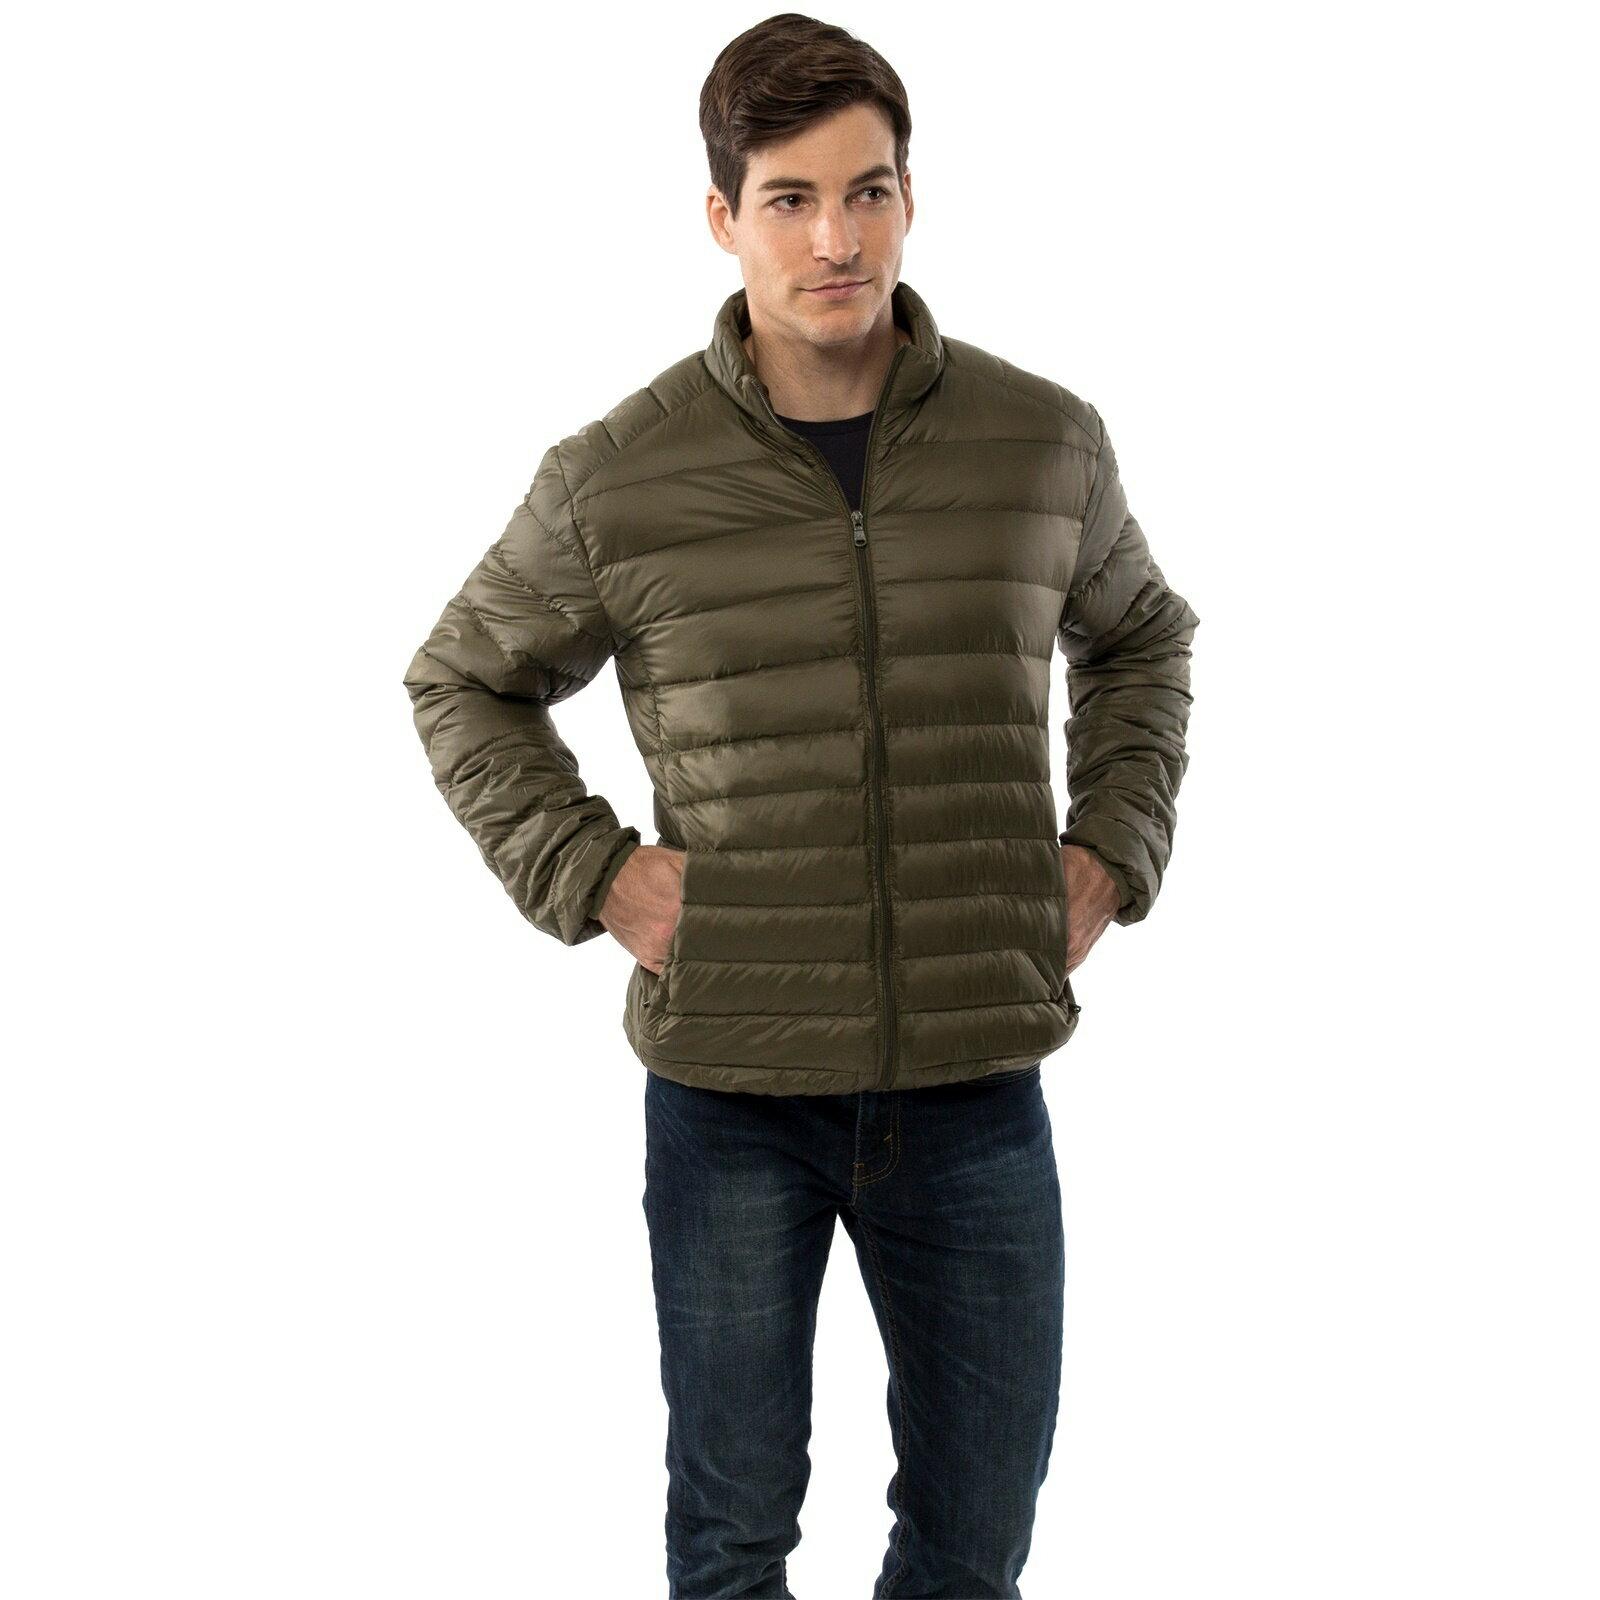 7e3f081e490 Alpine Swiss Niko Men's Down Jacket Puffer Bubble Coat Packable Light Warm  Parka 0